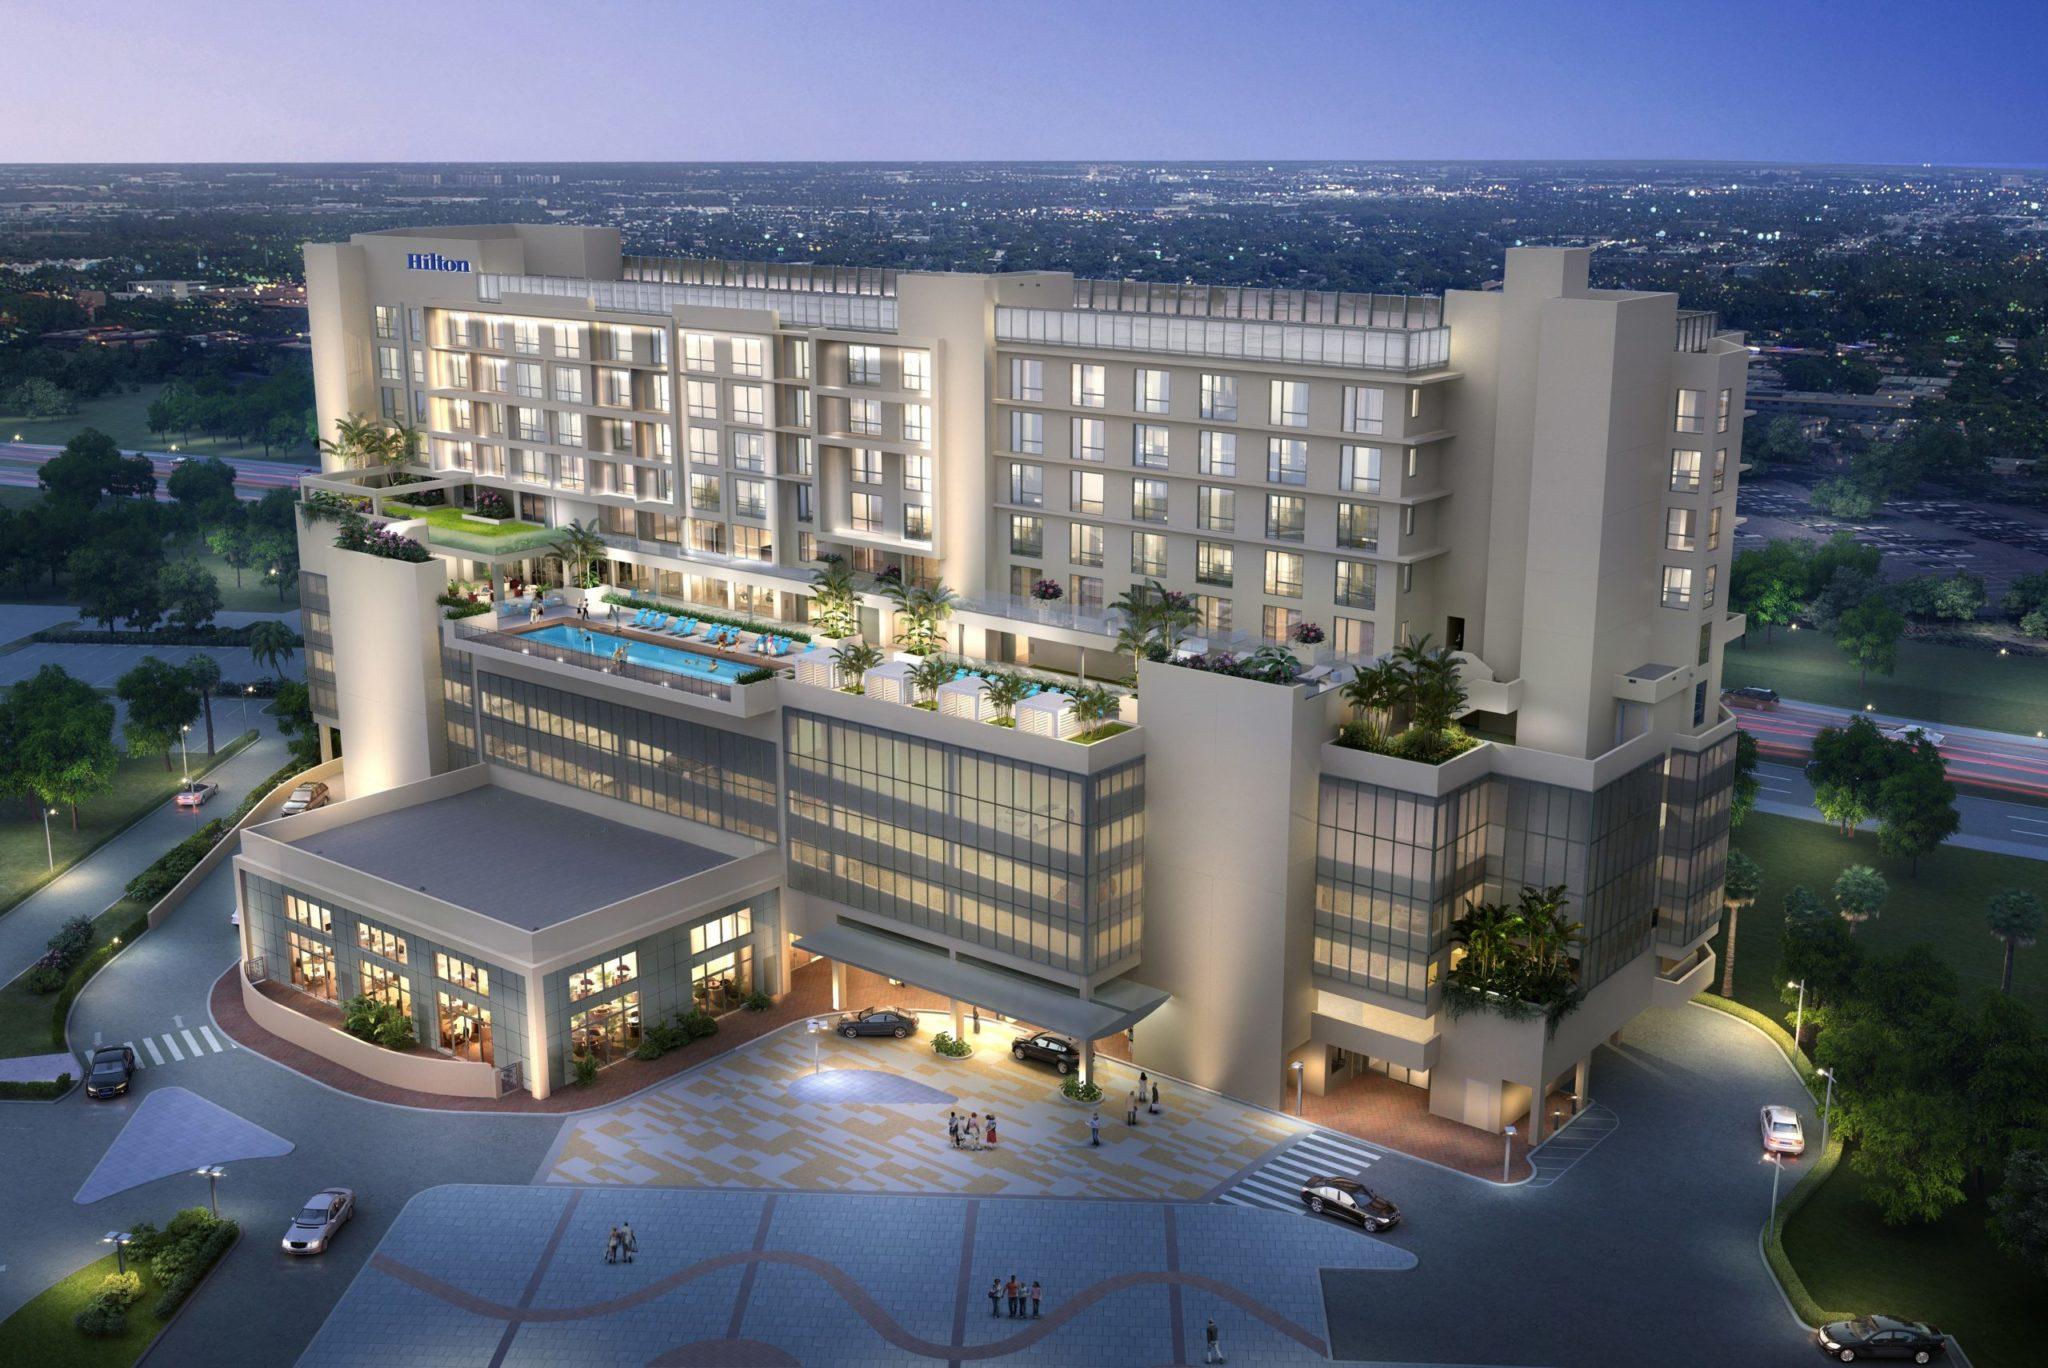 Hilton Aventura